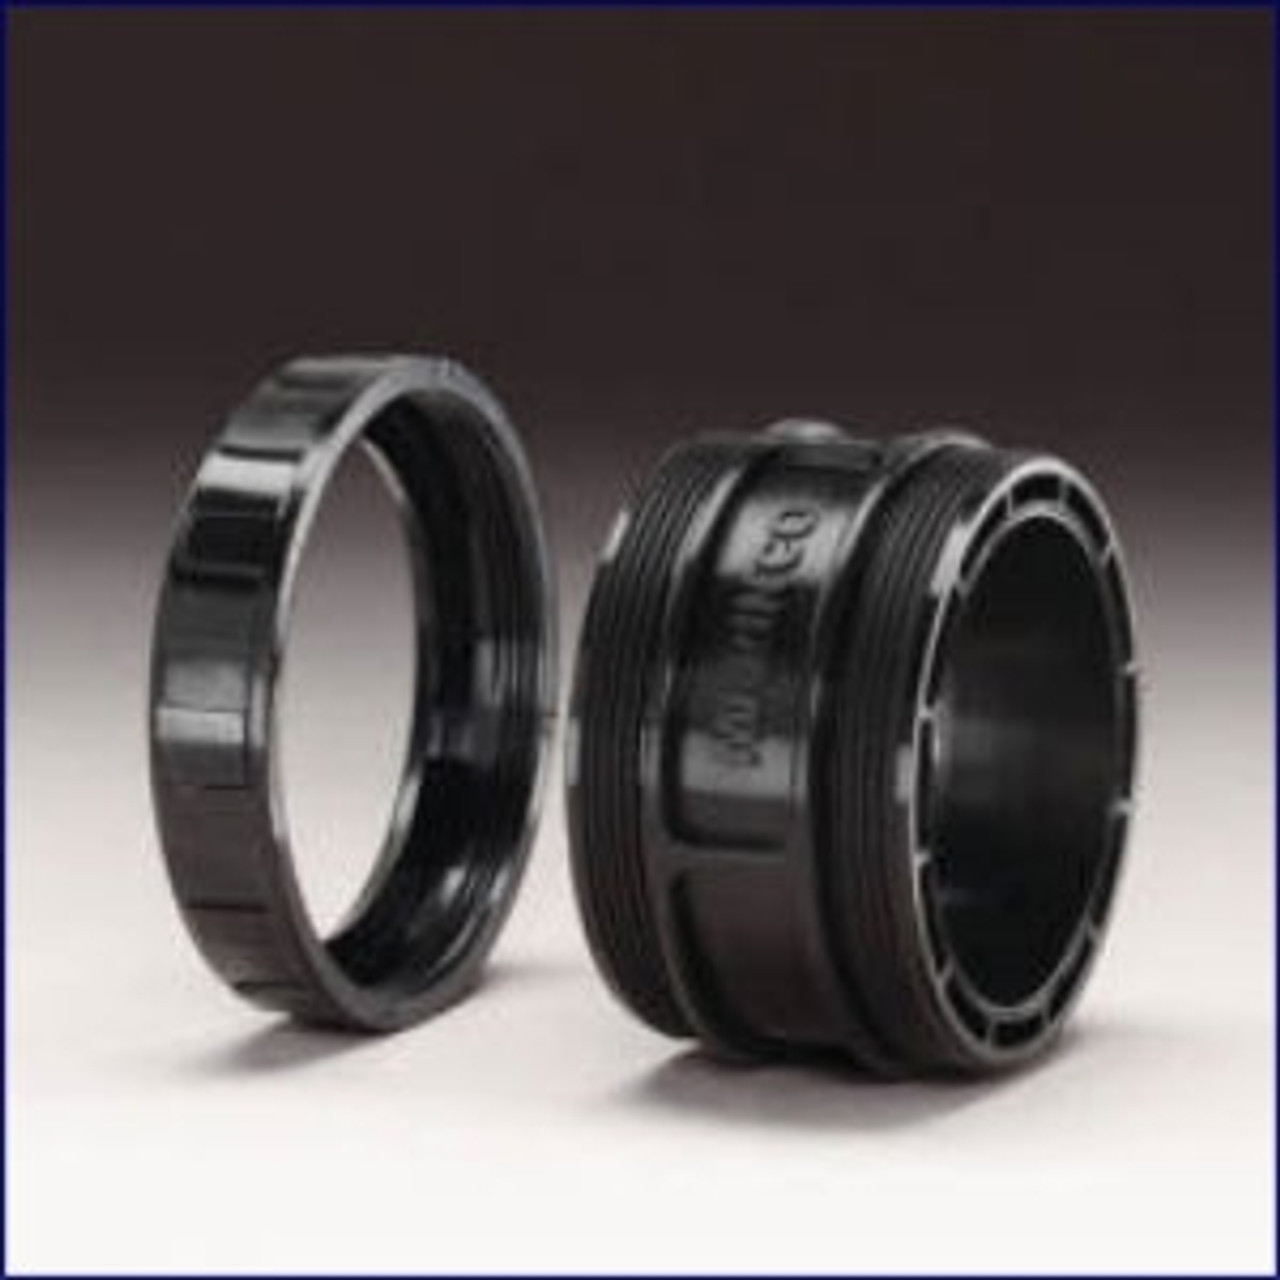 Marinco Sealing Collar with Threaded Ring 20A//30A 125V Locking 110R